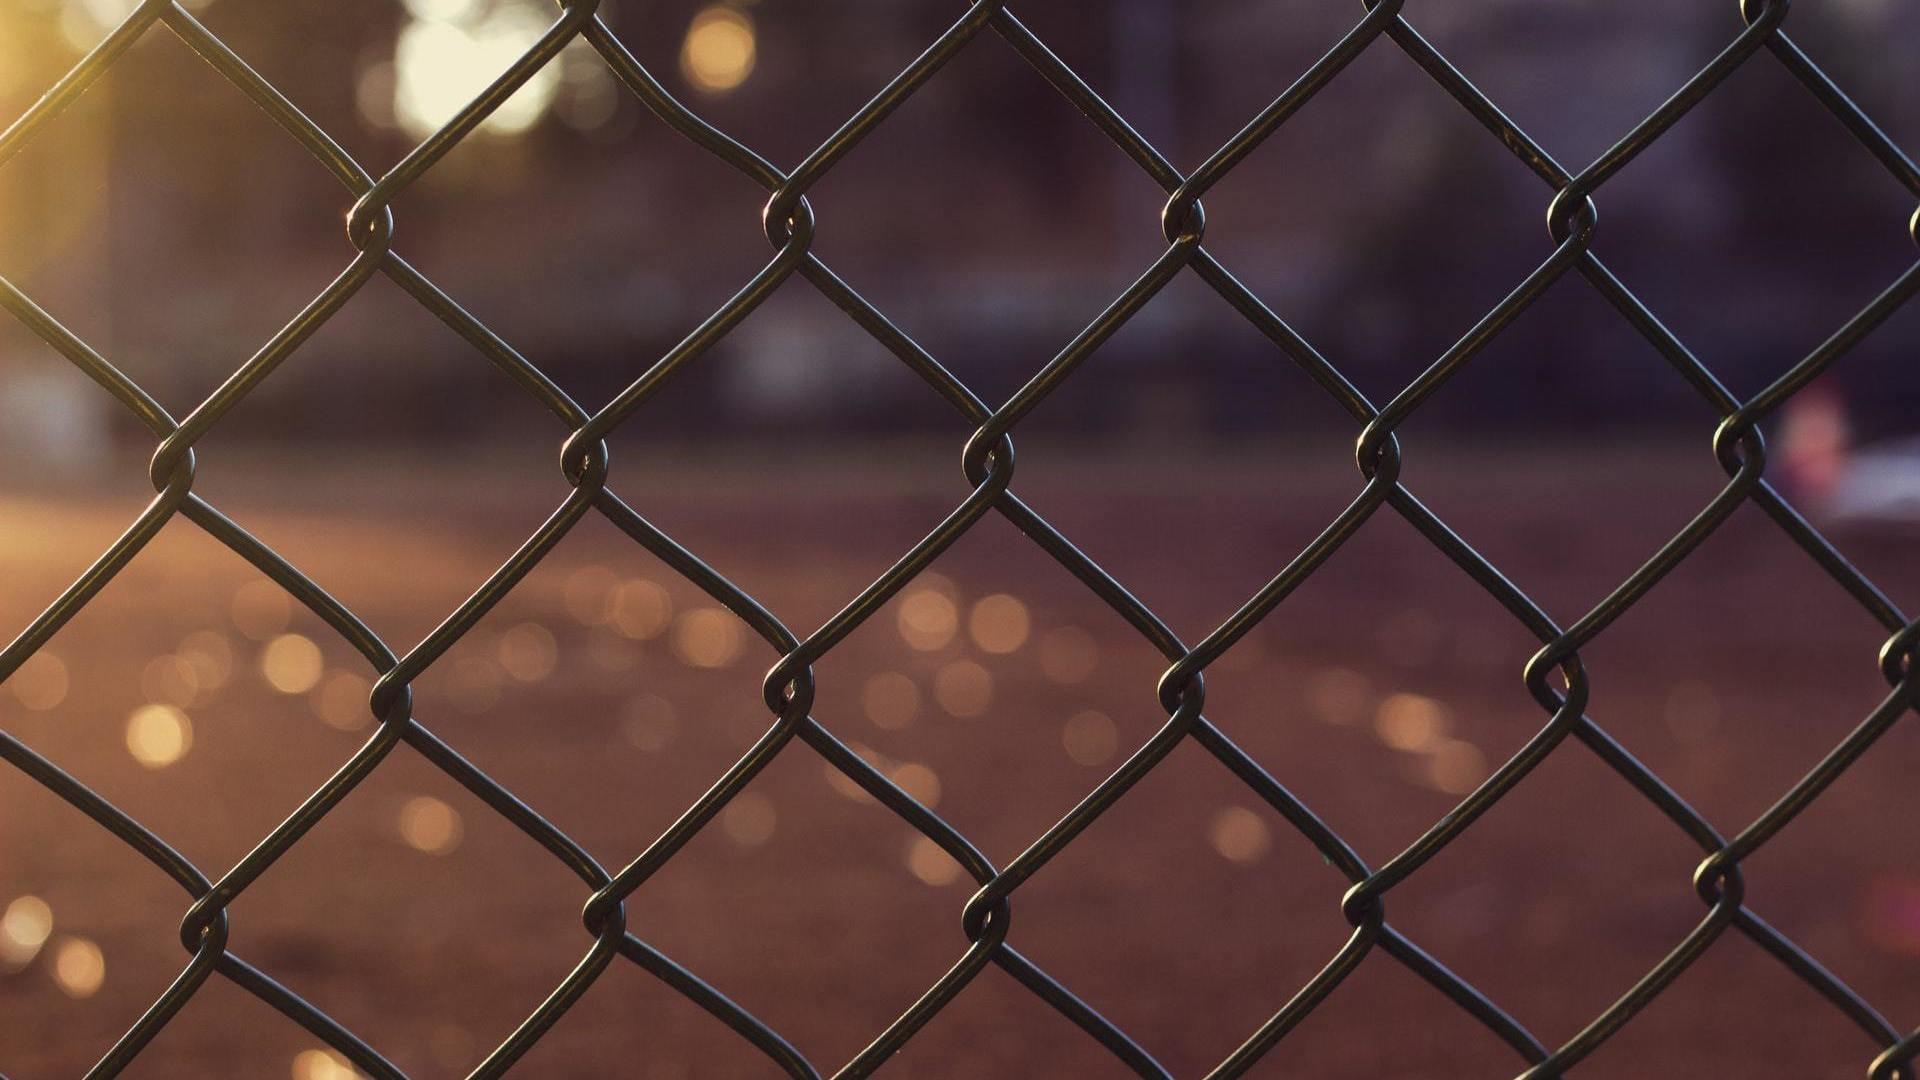 Recinzioni Per Case Di Montagna i migliori 30 tecnici per recinti elettrici a firenze (con